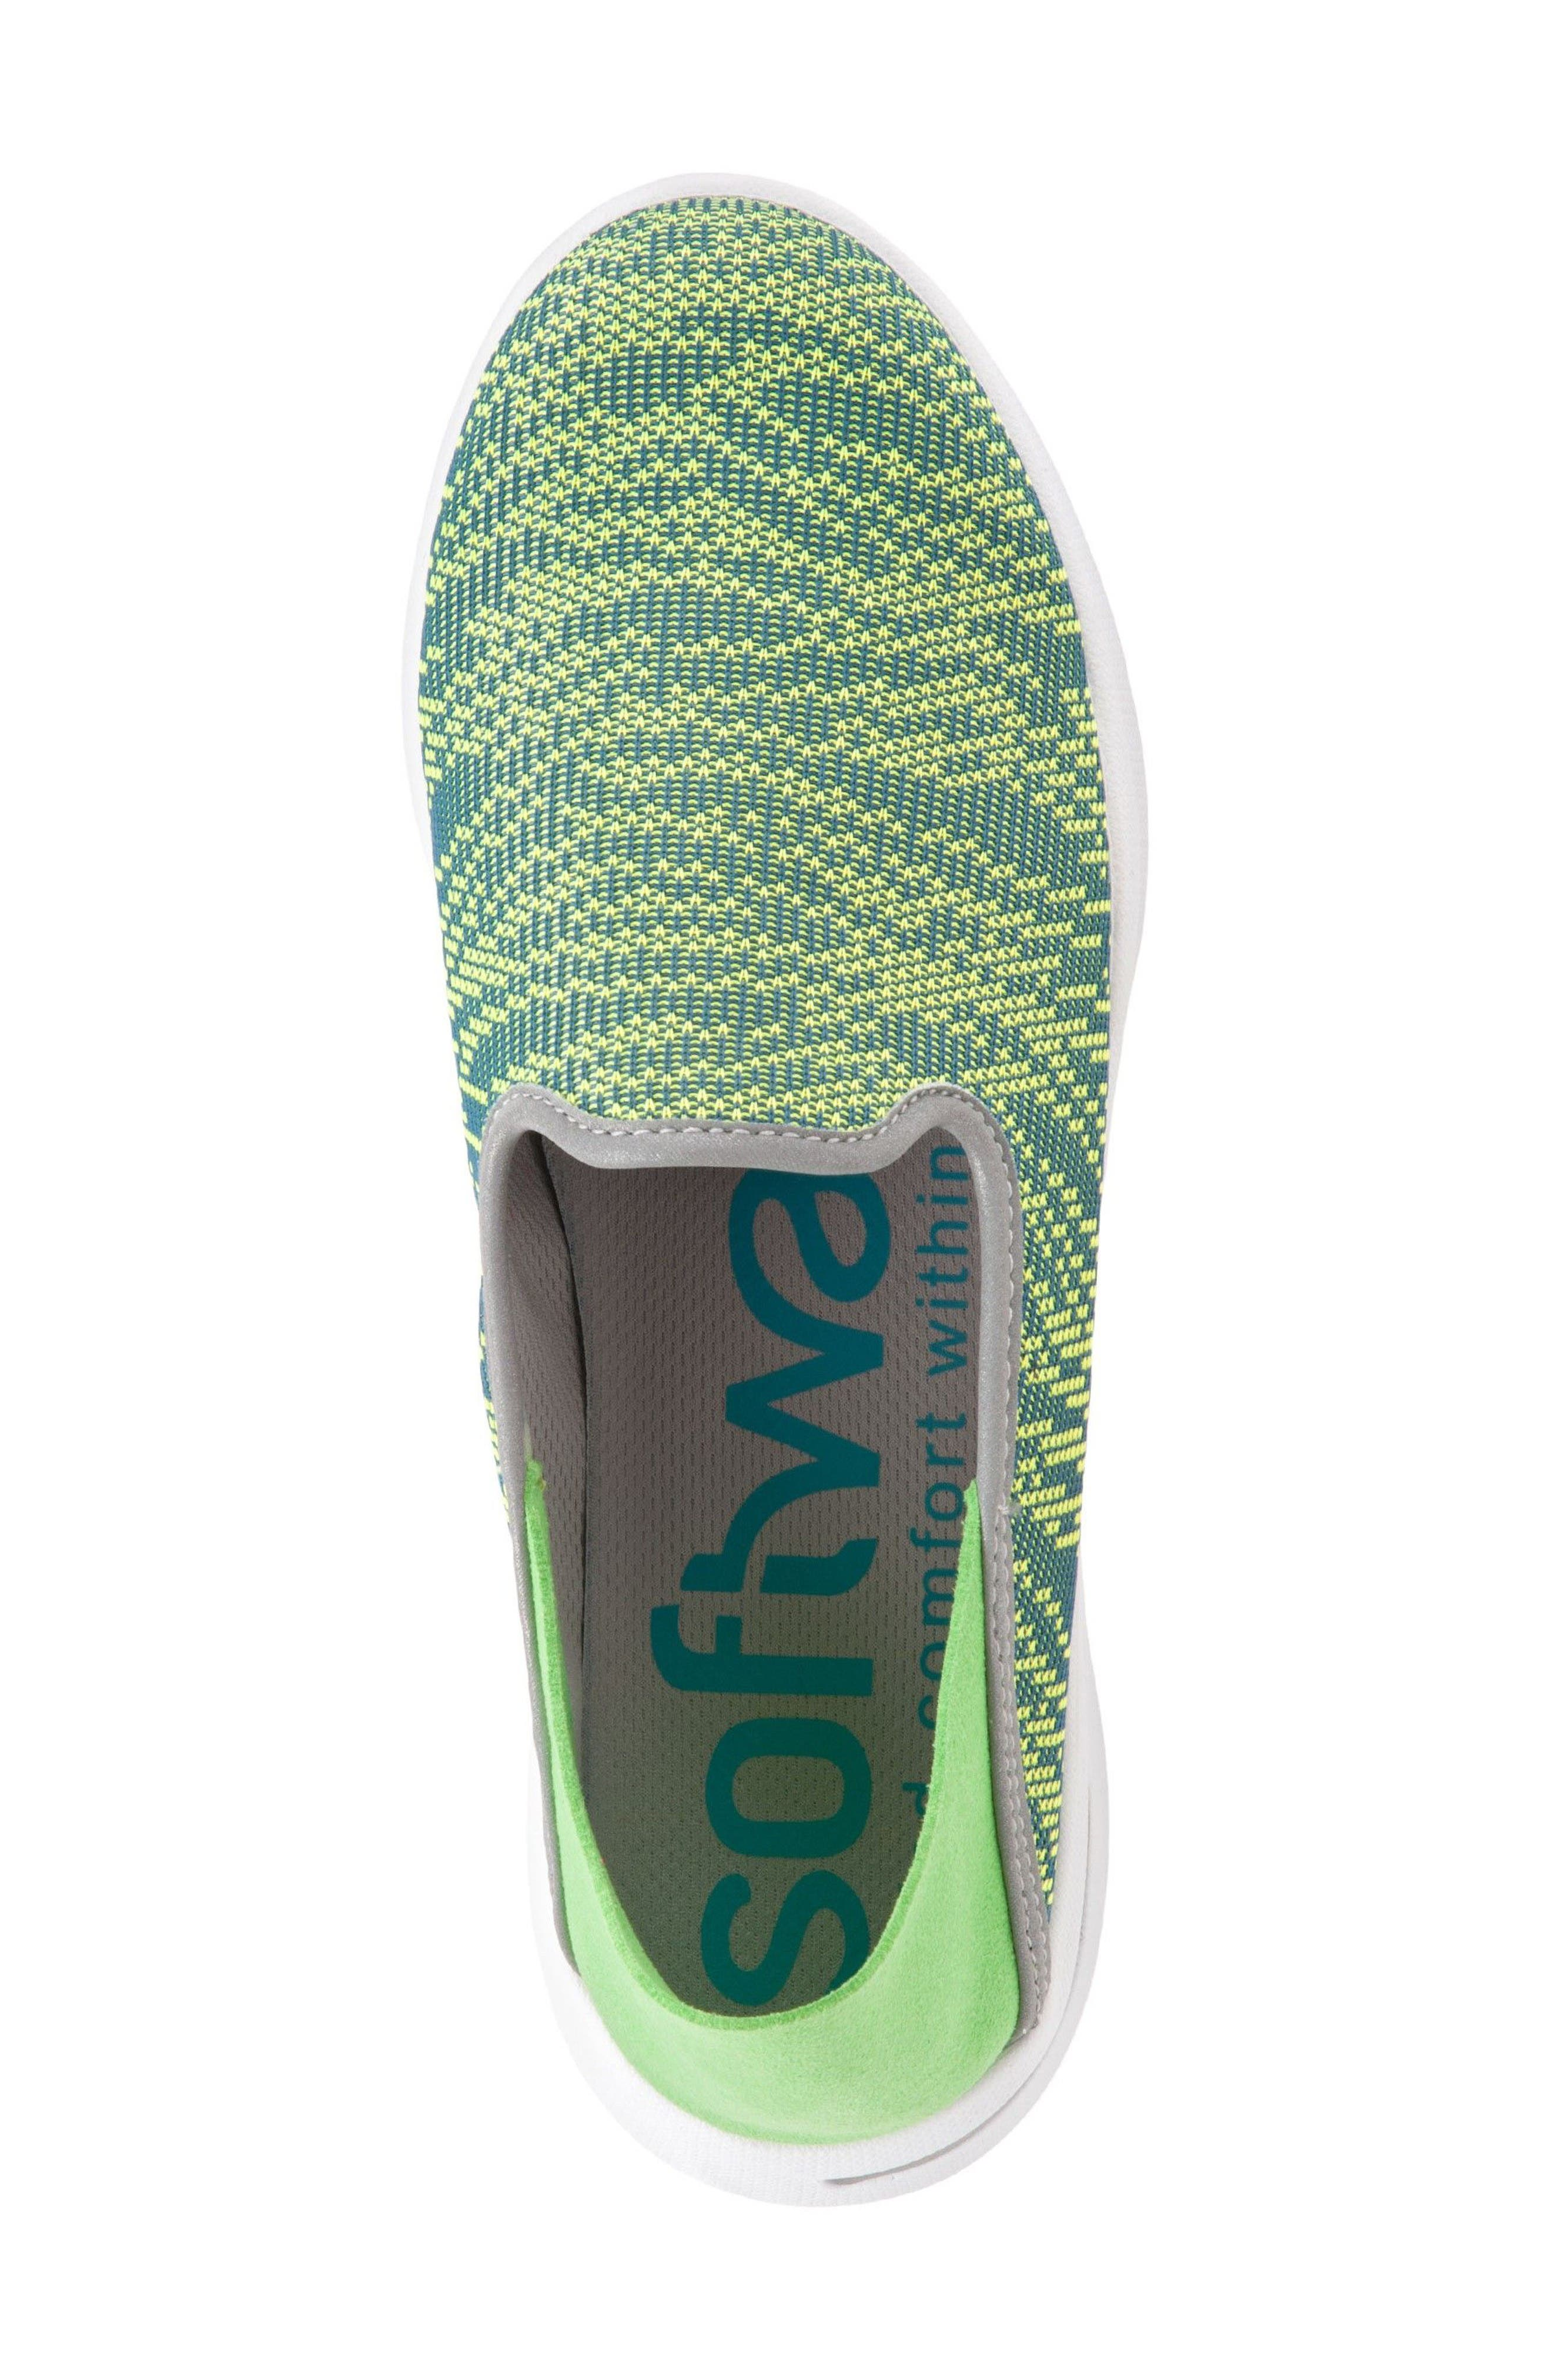 Convertible Slip-On Sneaker,                             Alternate thumbnail 3, color,                             Green Fabric